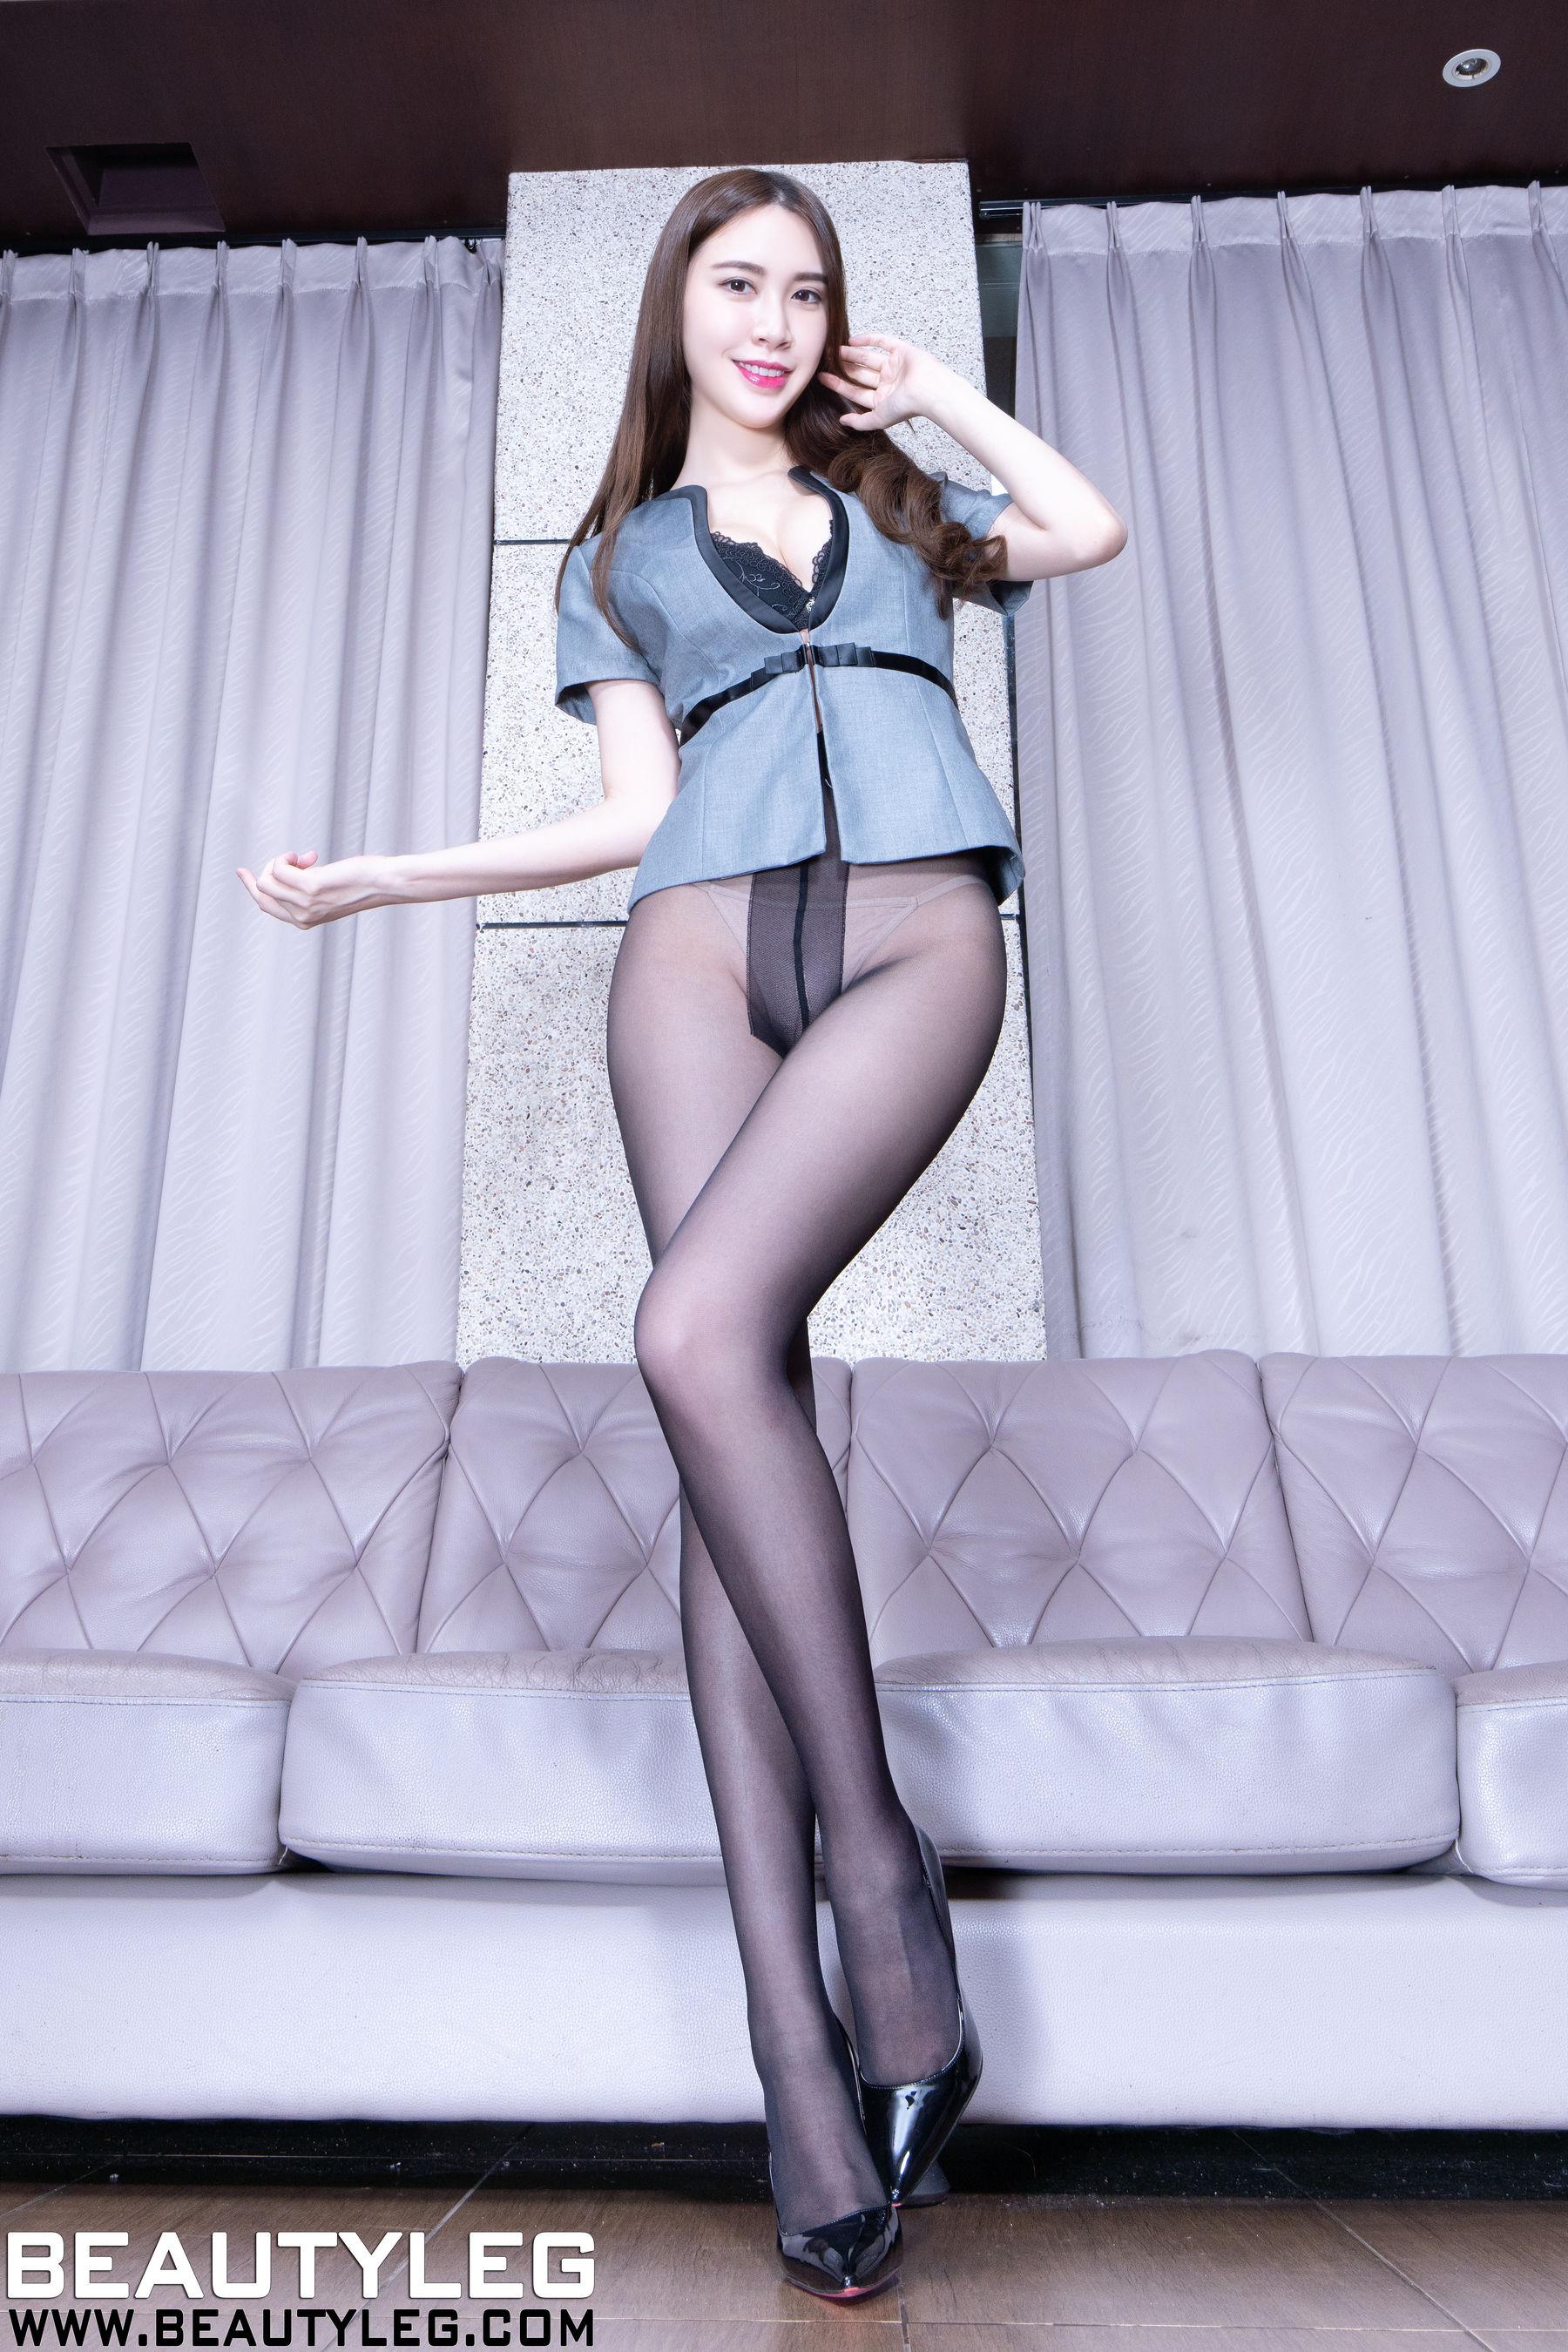 VOL.711 [Beautyleg]丝袜美腿:崔多朵(崔德蓉,腿模Stephy)超高清个人性感漂亮大图(48P)